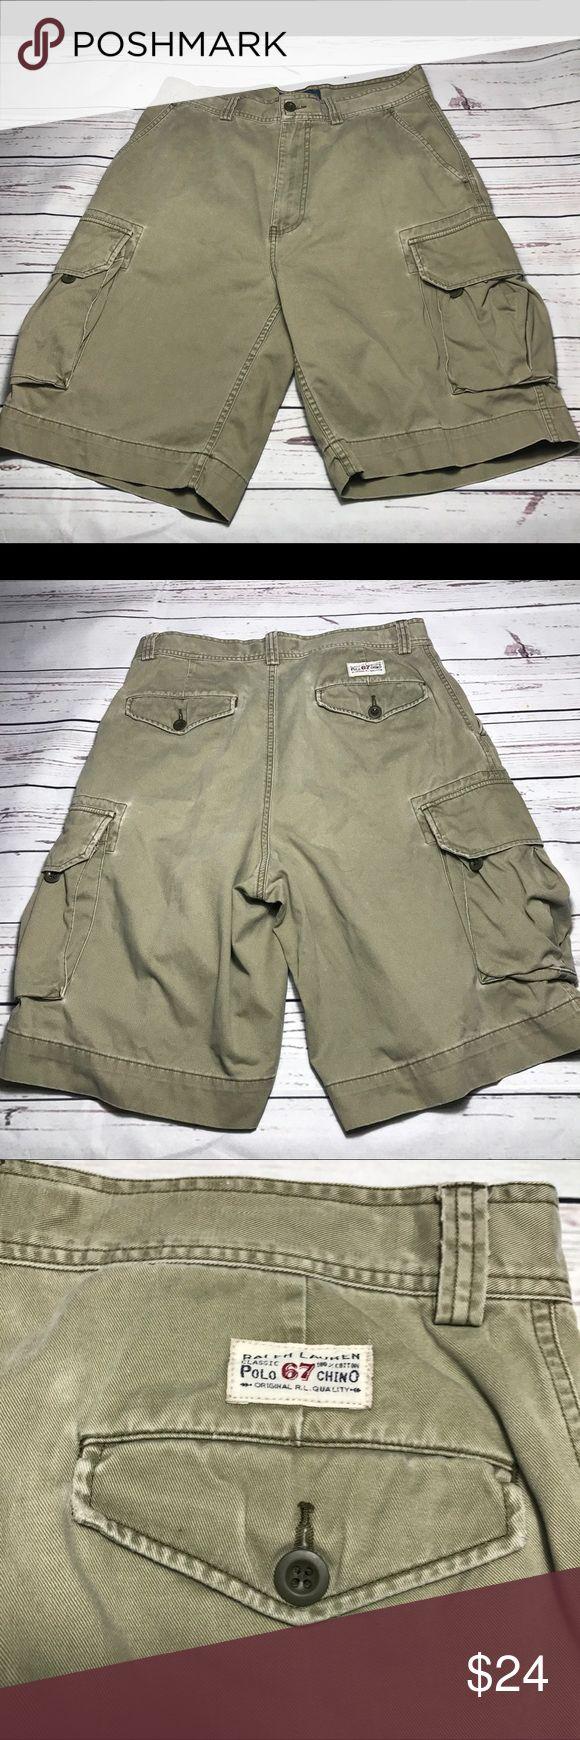 "Ralph Lauren Polo Cargo Shorts Chino Men's Size 33 Polo Ralph Lauren Cargo Shorts Size 33 Broken-In Feel Green/Tan Good Condition Minor Fabric Wear  Length: 21"" Inseam: 10""    B Polo by Ralph Lauren Shorts Cargo"